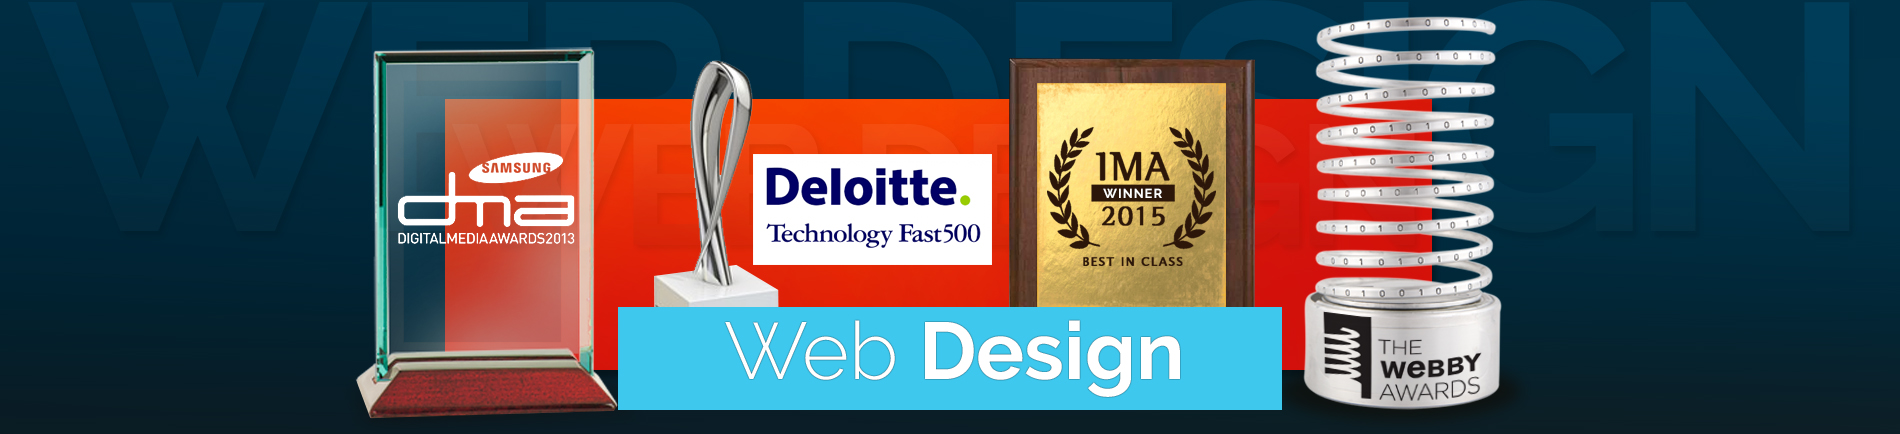 web design belfast ryco marketing